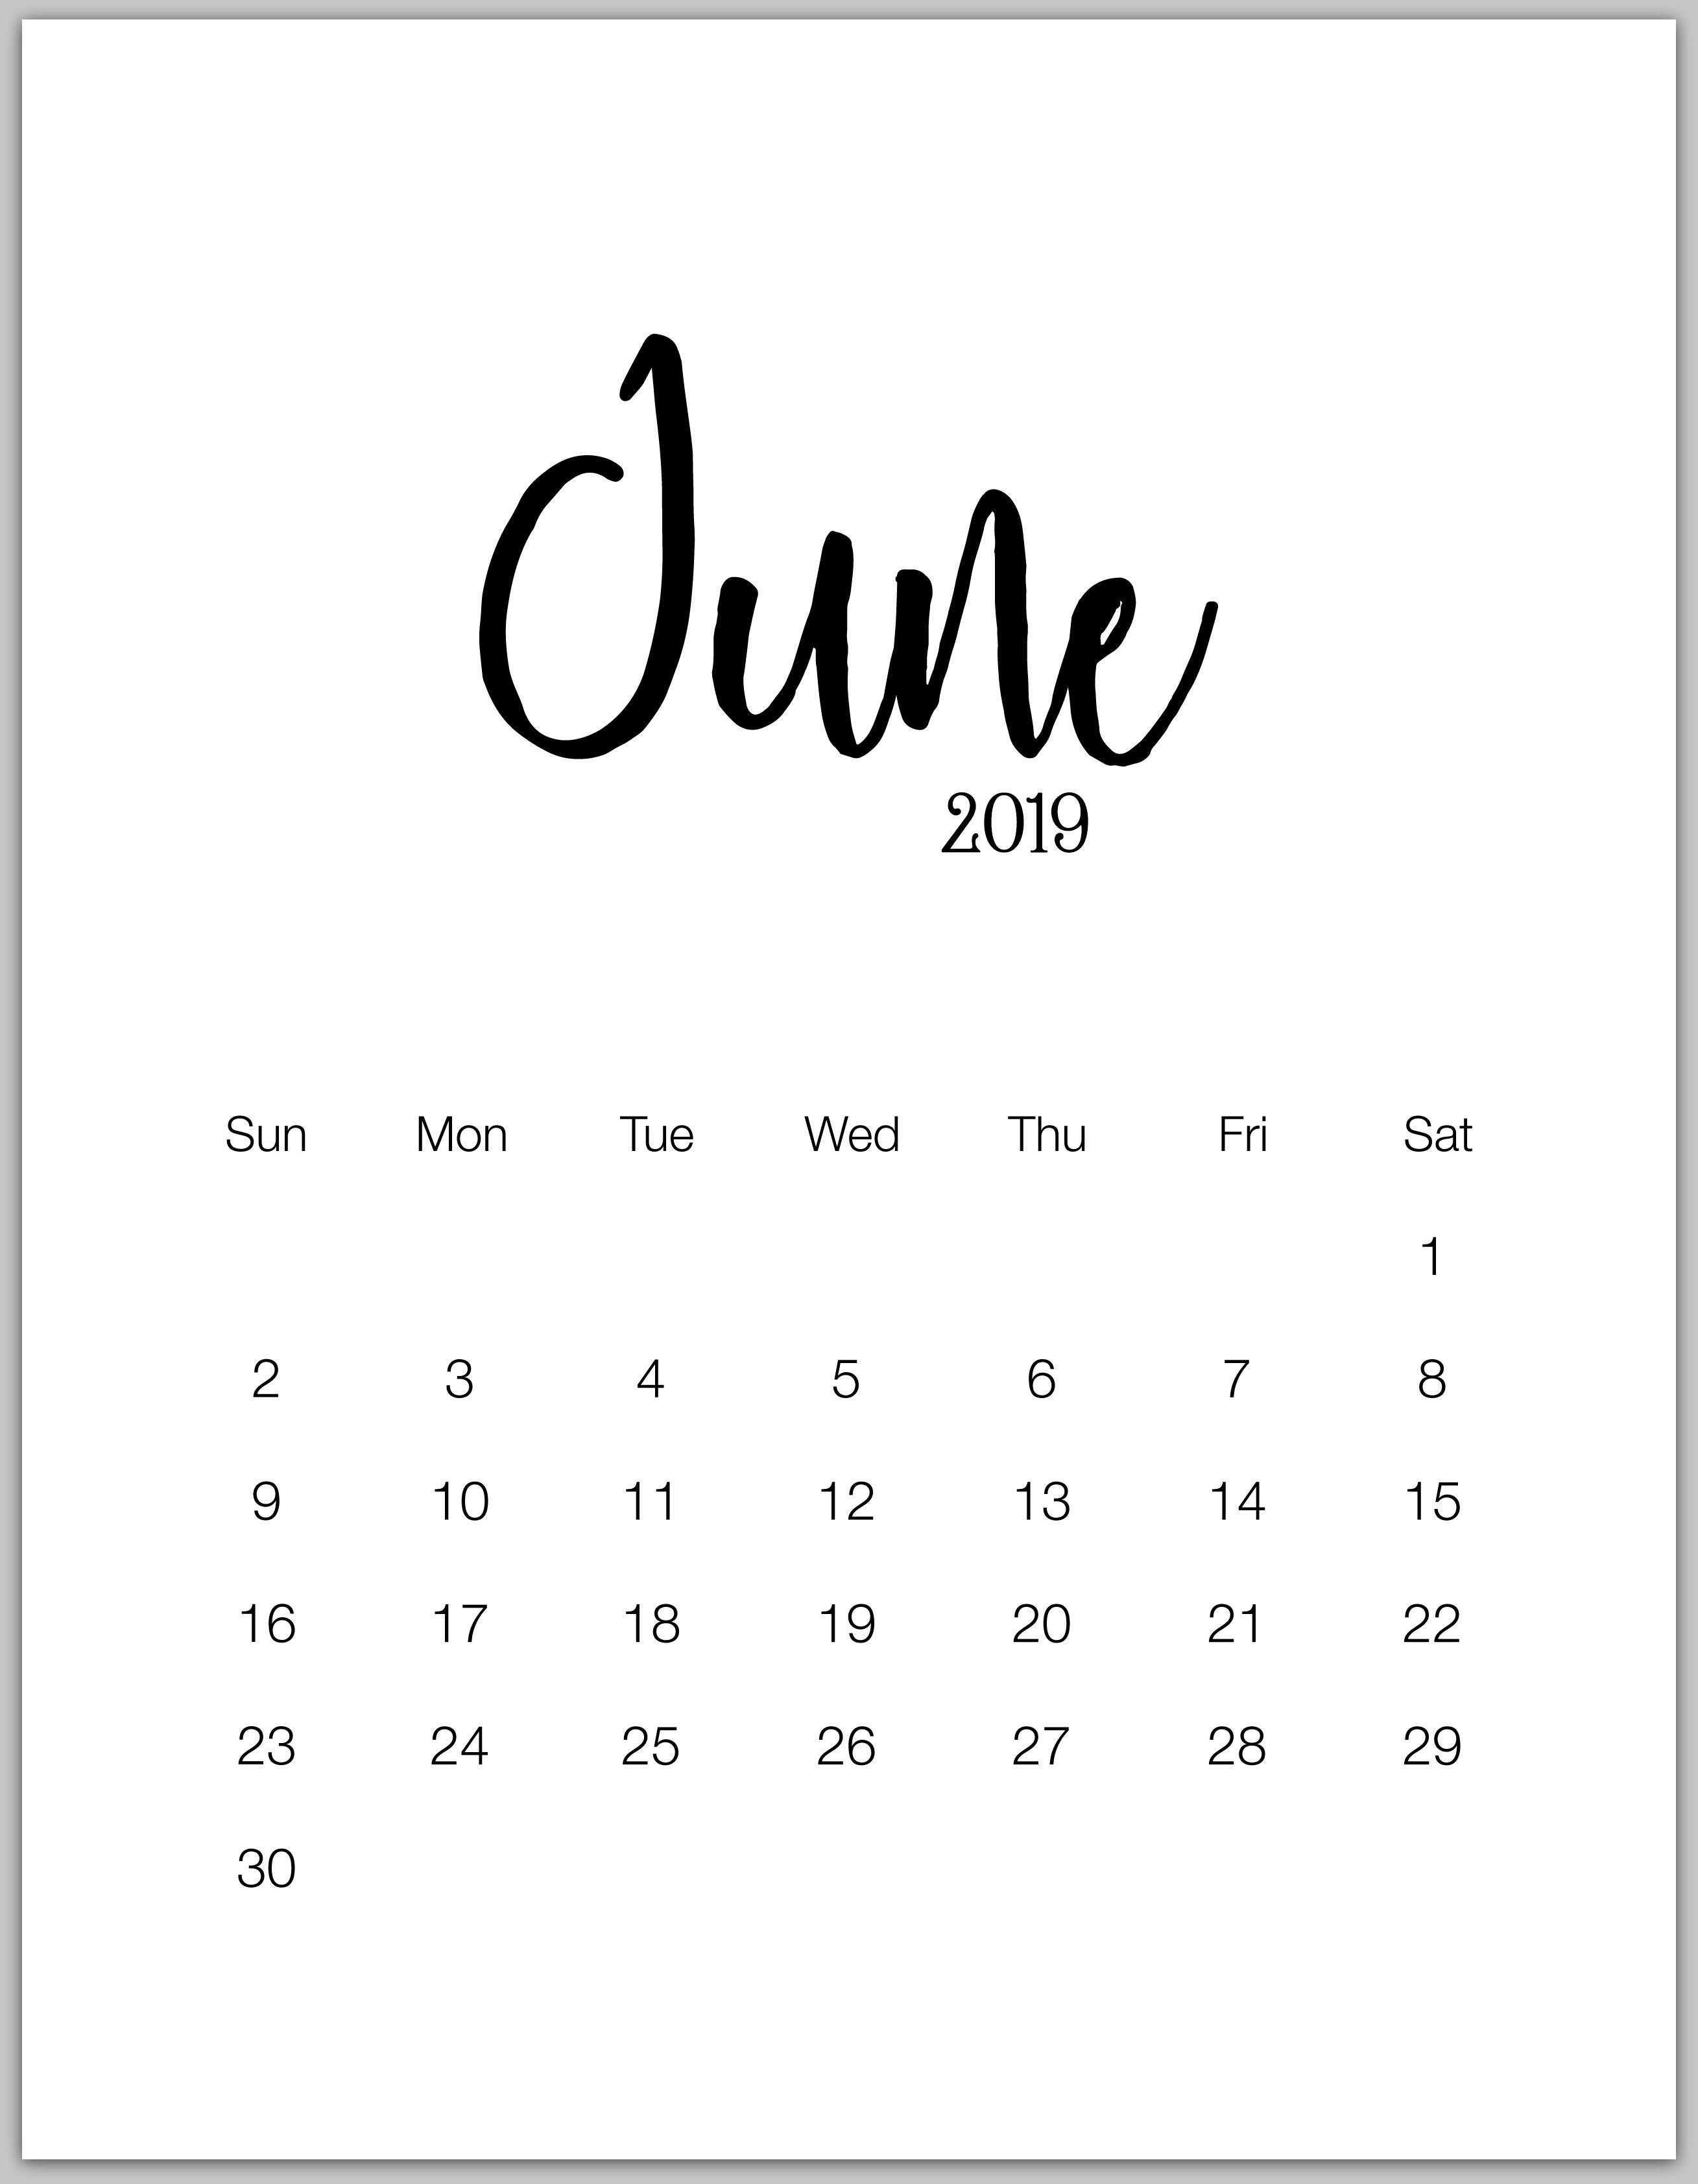 June 2019 Minimalist Calendar | ☆ Calendars ☆ | Calendar 2019 June 9 2019 Calendar